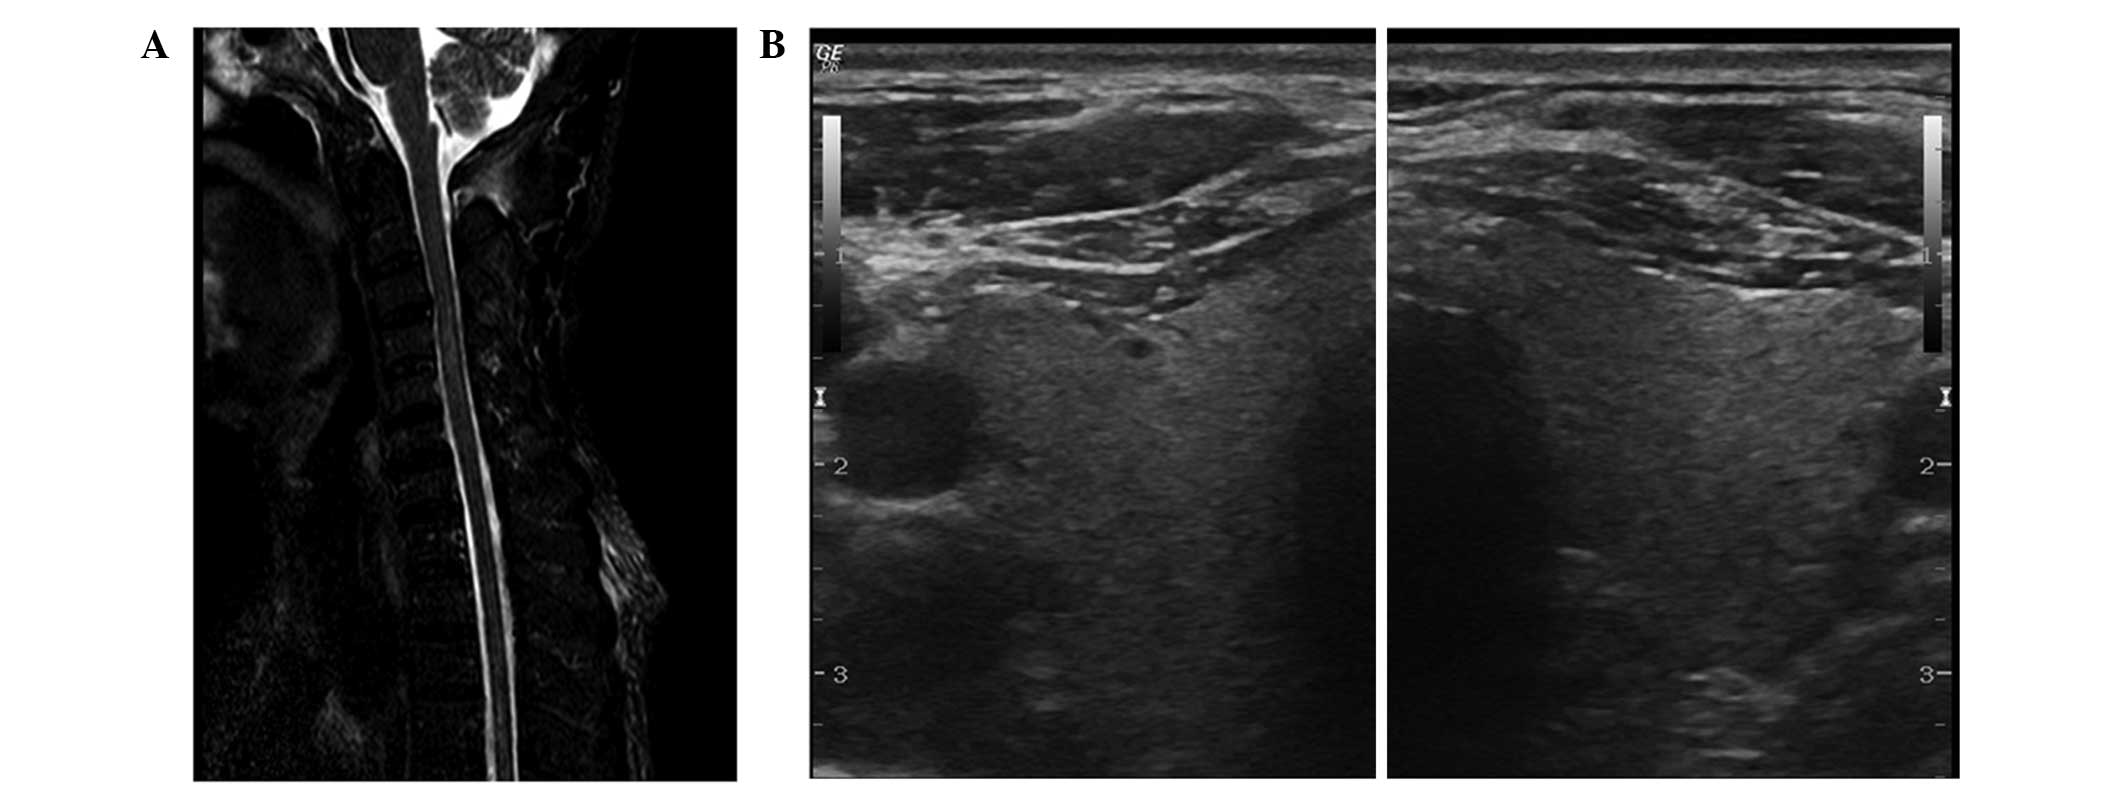 Acute transverse myelitis and subacute thyroiditis